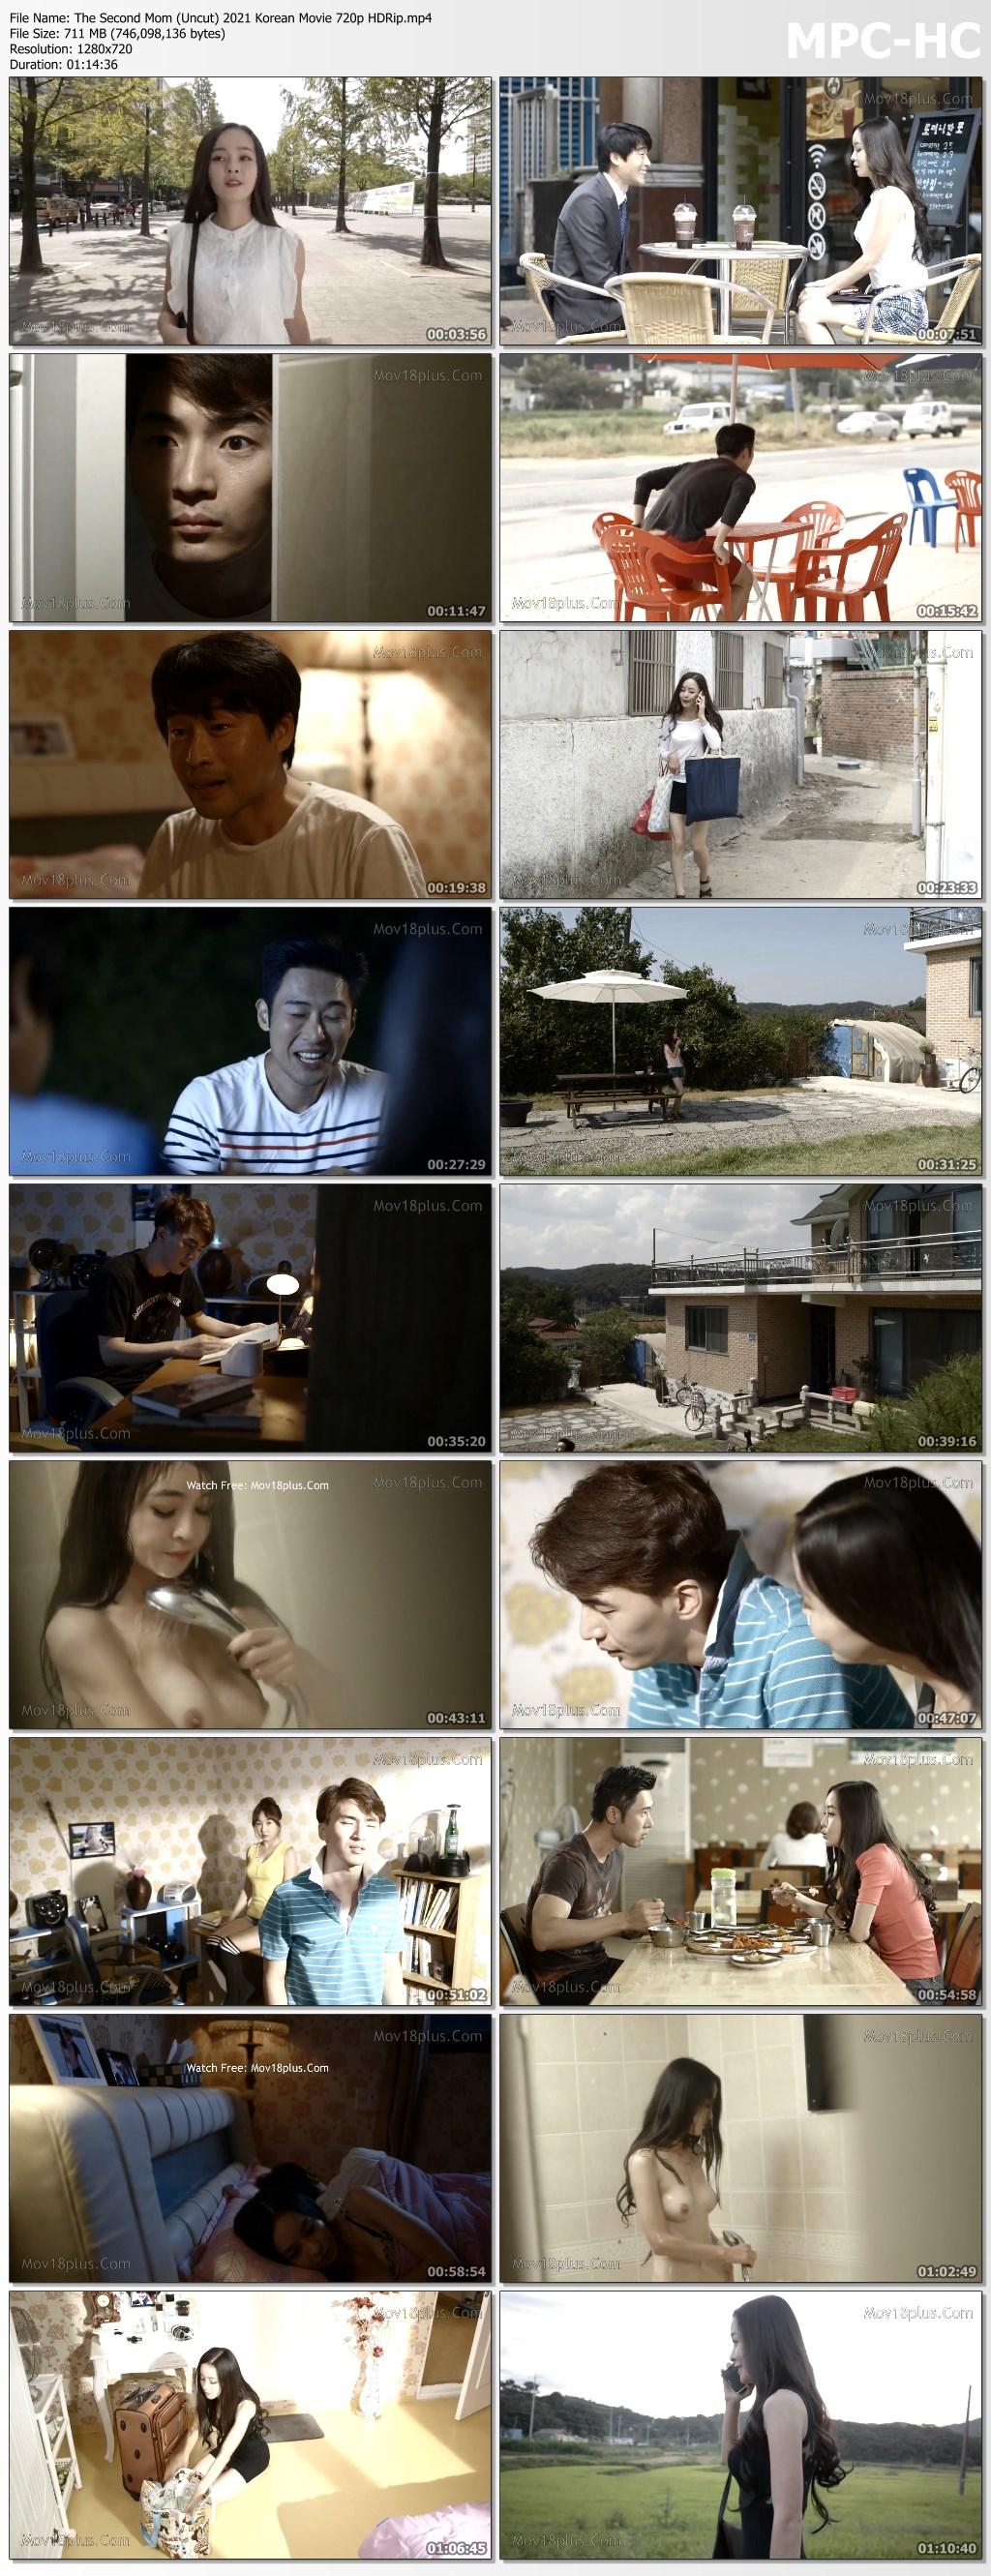 The Second Mom (Uncut) 2021 Korean Movie 720p HDRip.mp4 thumbs